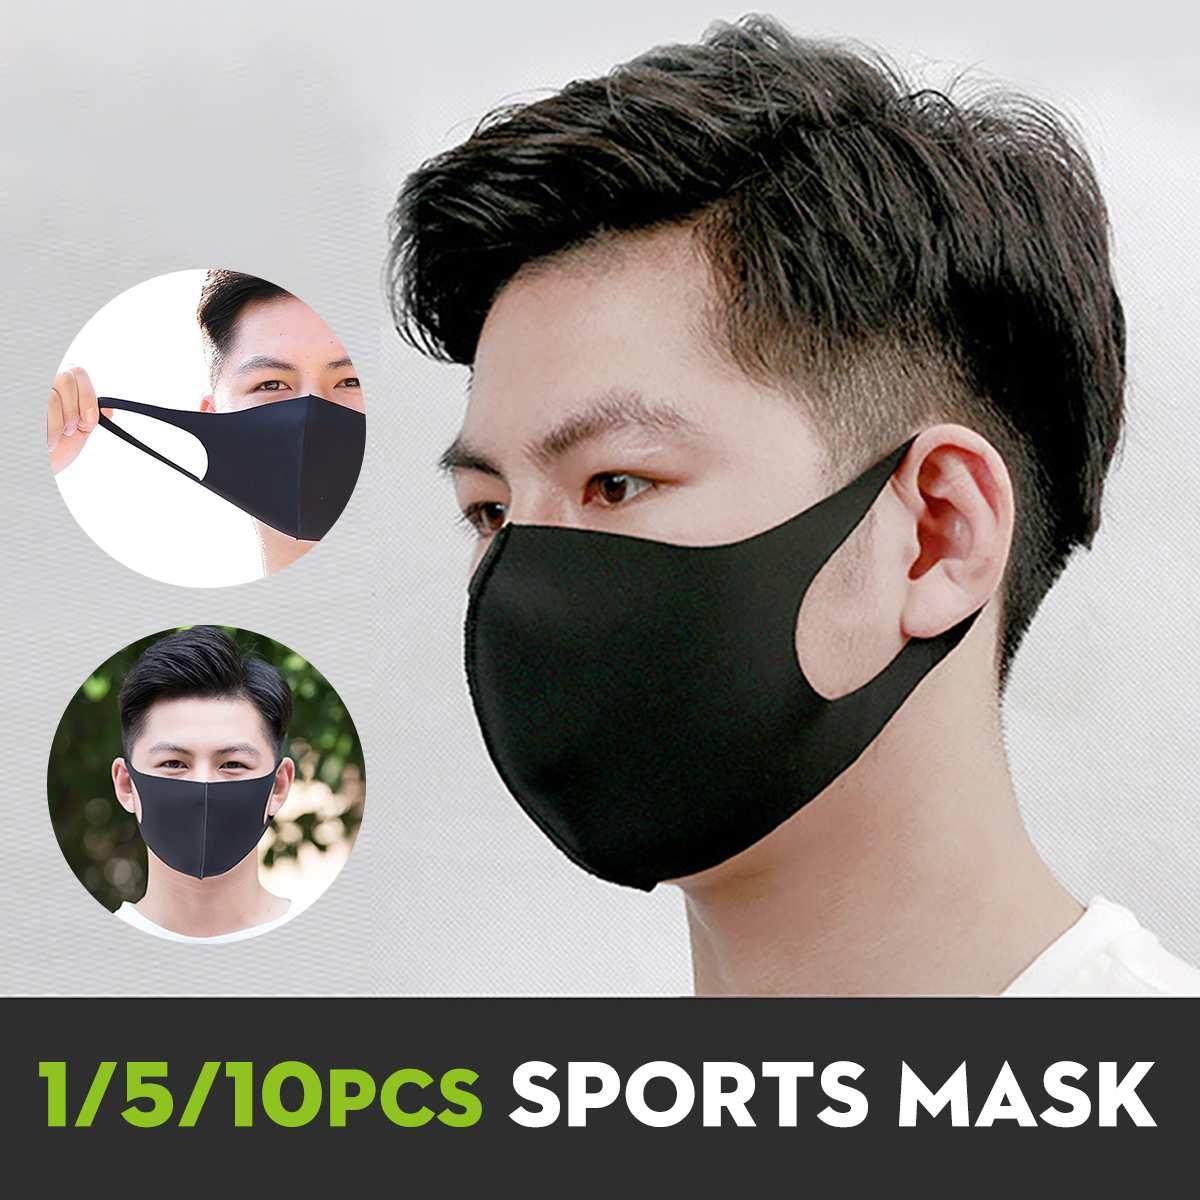 1/5/10Pcs Cotton Face Mask Mouth Mask Reusable Washable Earloop Mask Isolation Protection Anti Dust Haze Outdoor Dustproof Masks